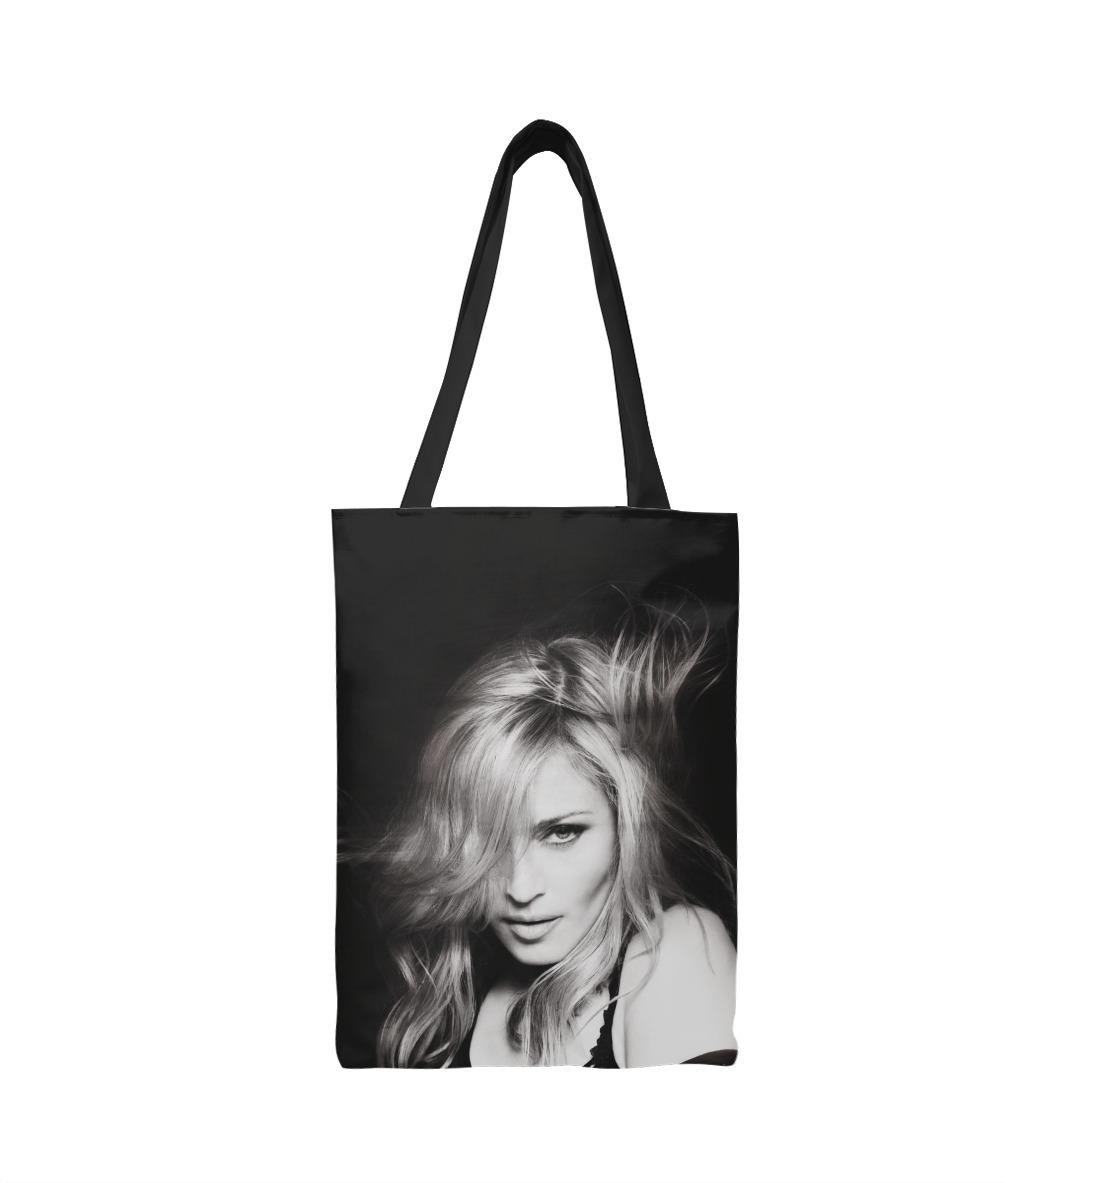 Фото - Мадонна сент майкл м мадонна говорит